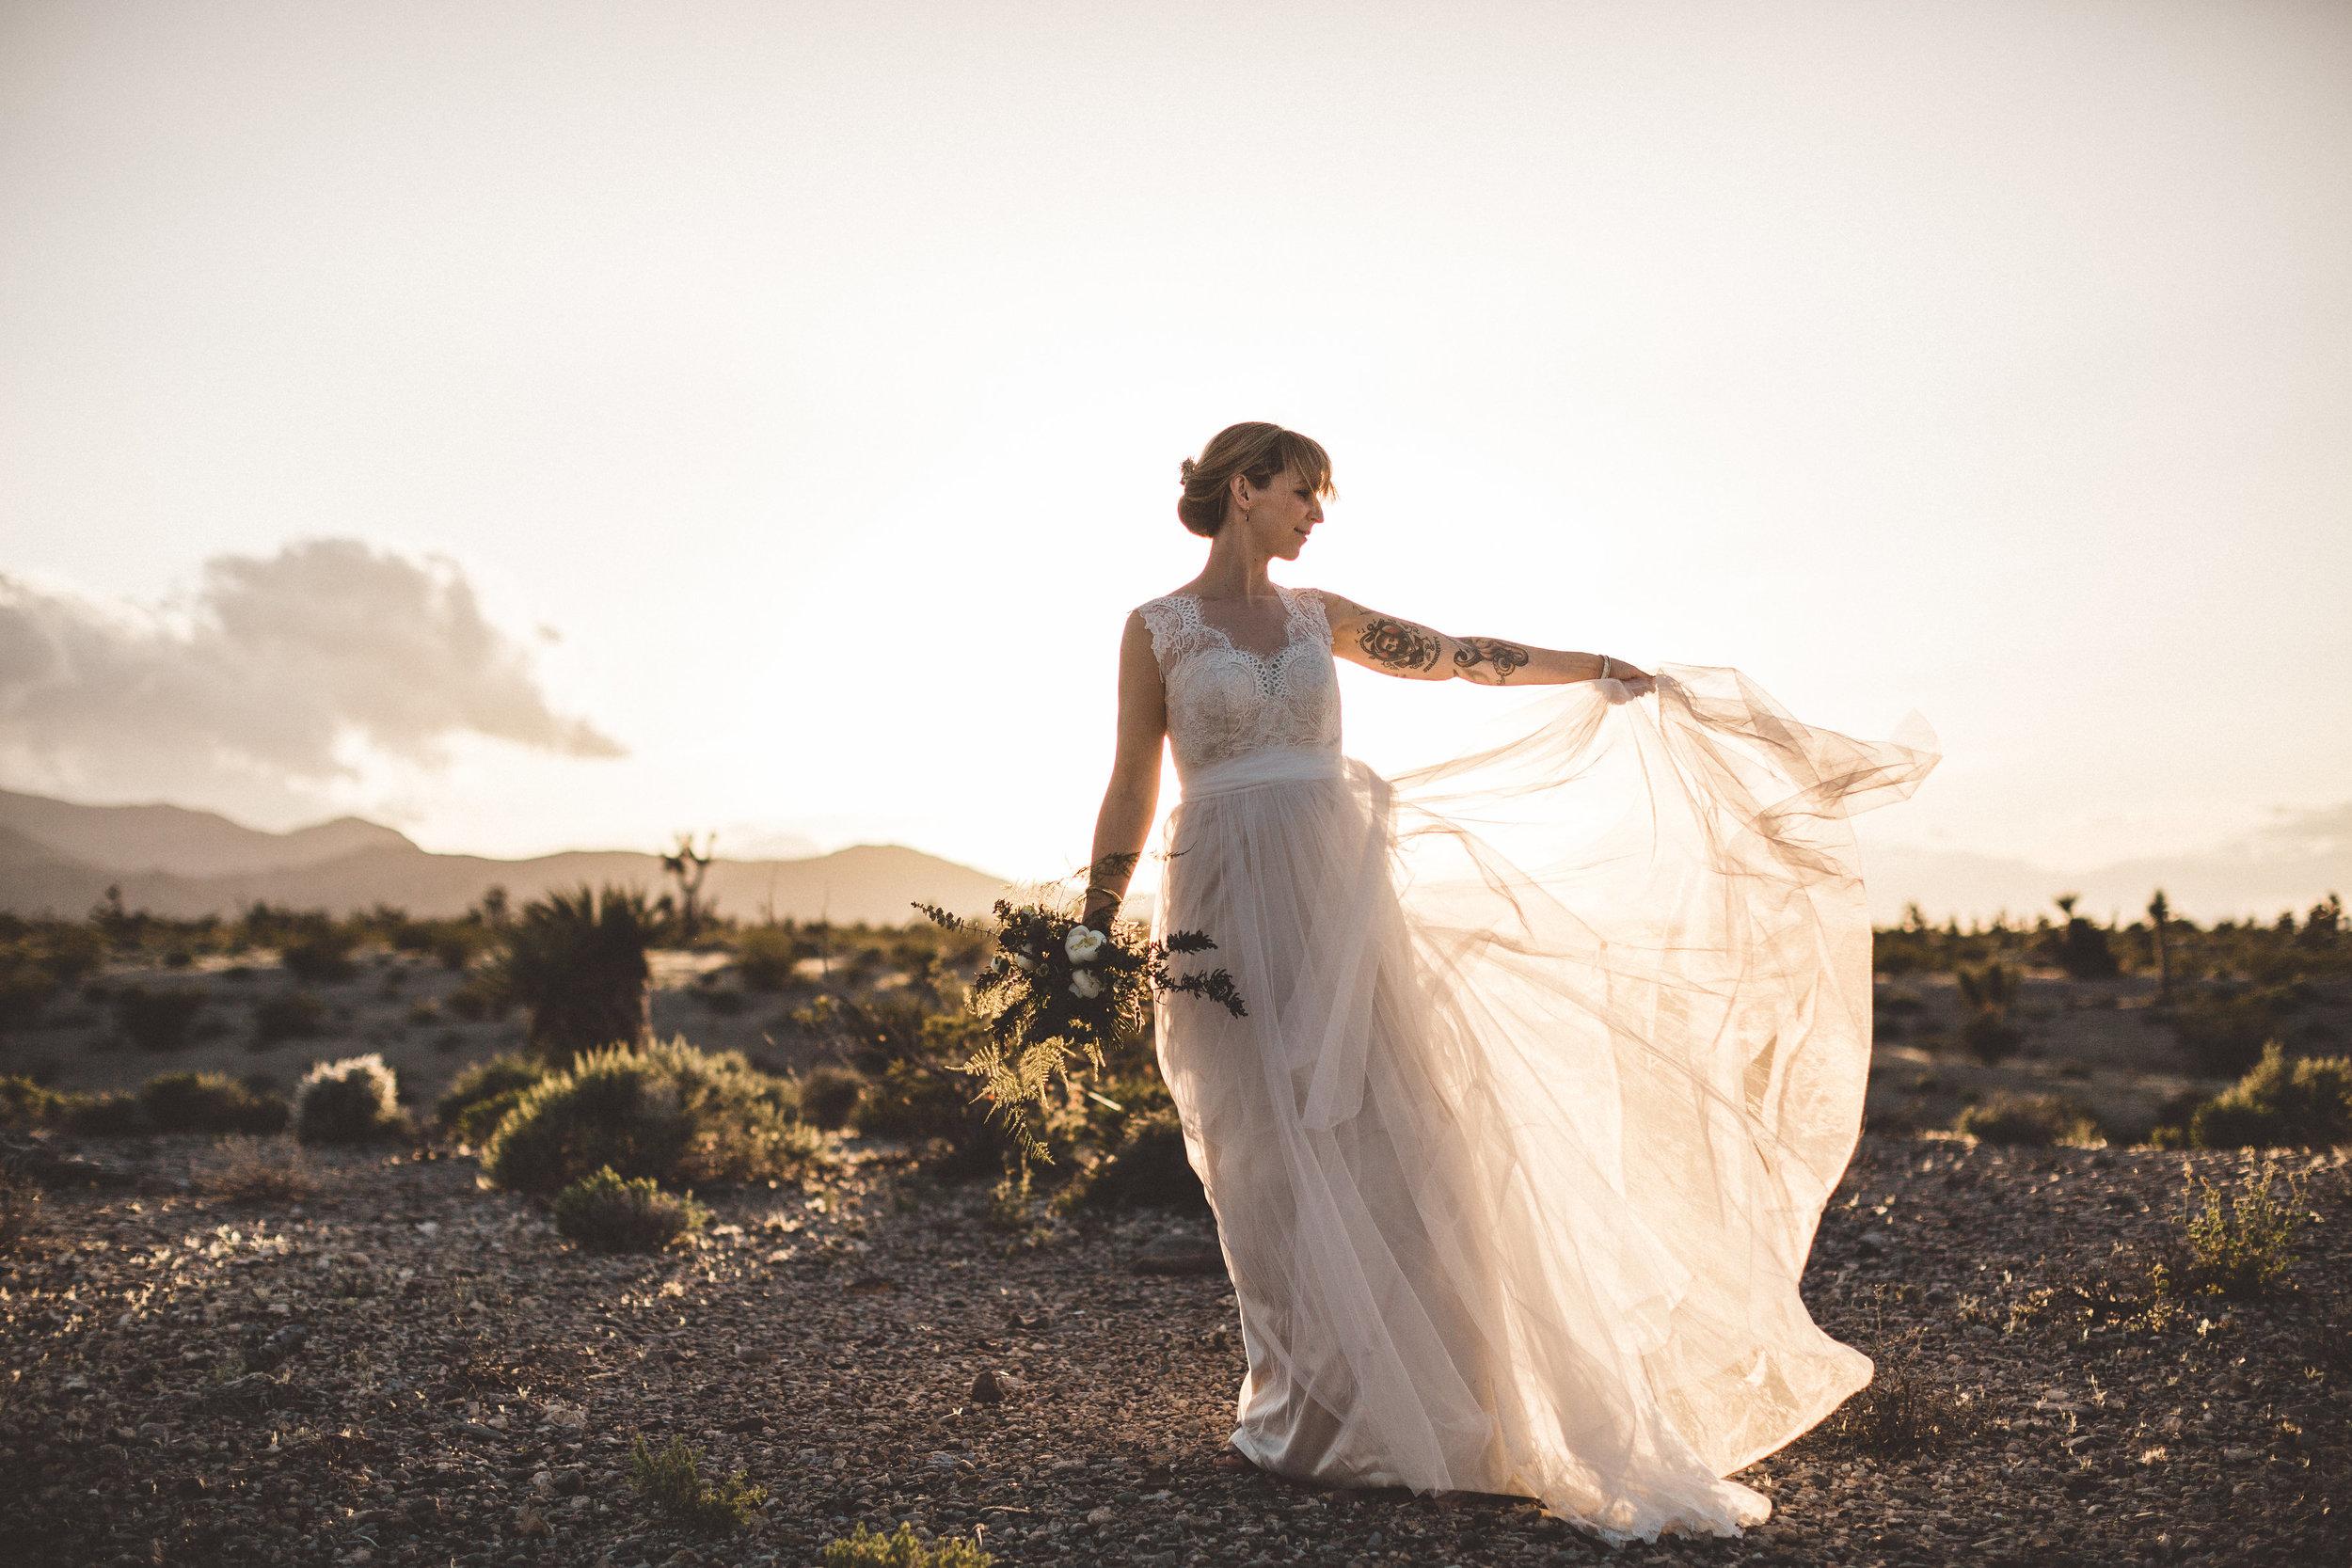 meike-and-rene-las-vegas-desert-elopement47.jpg